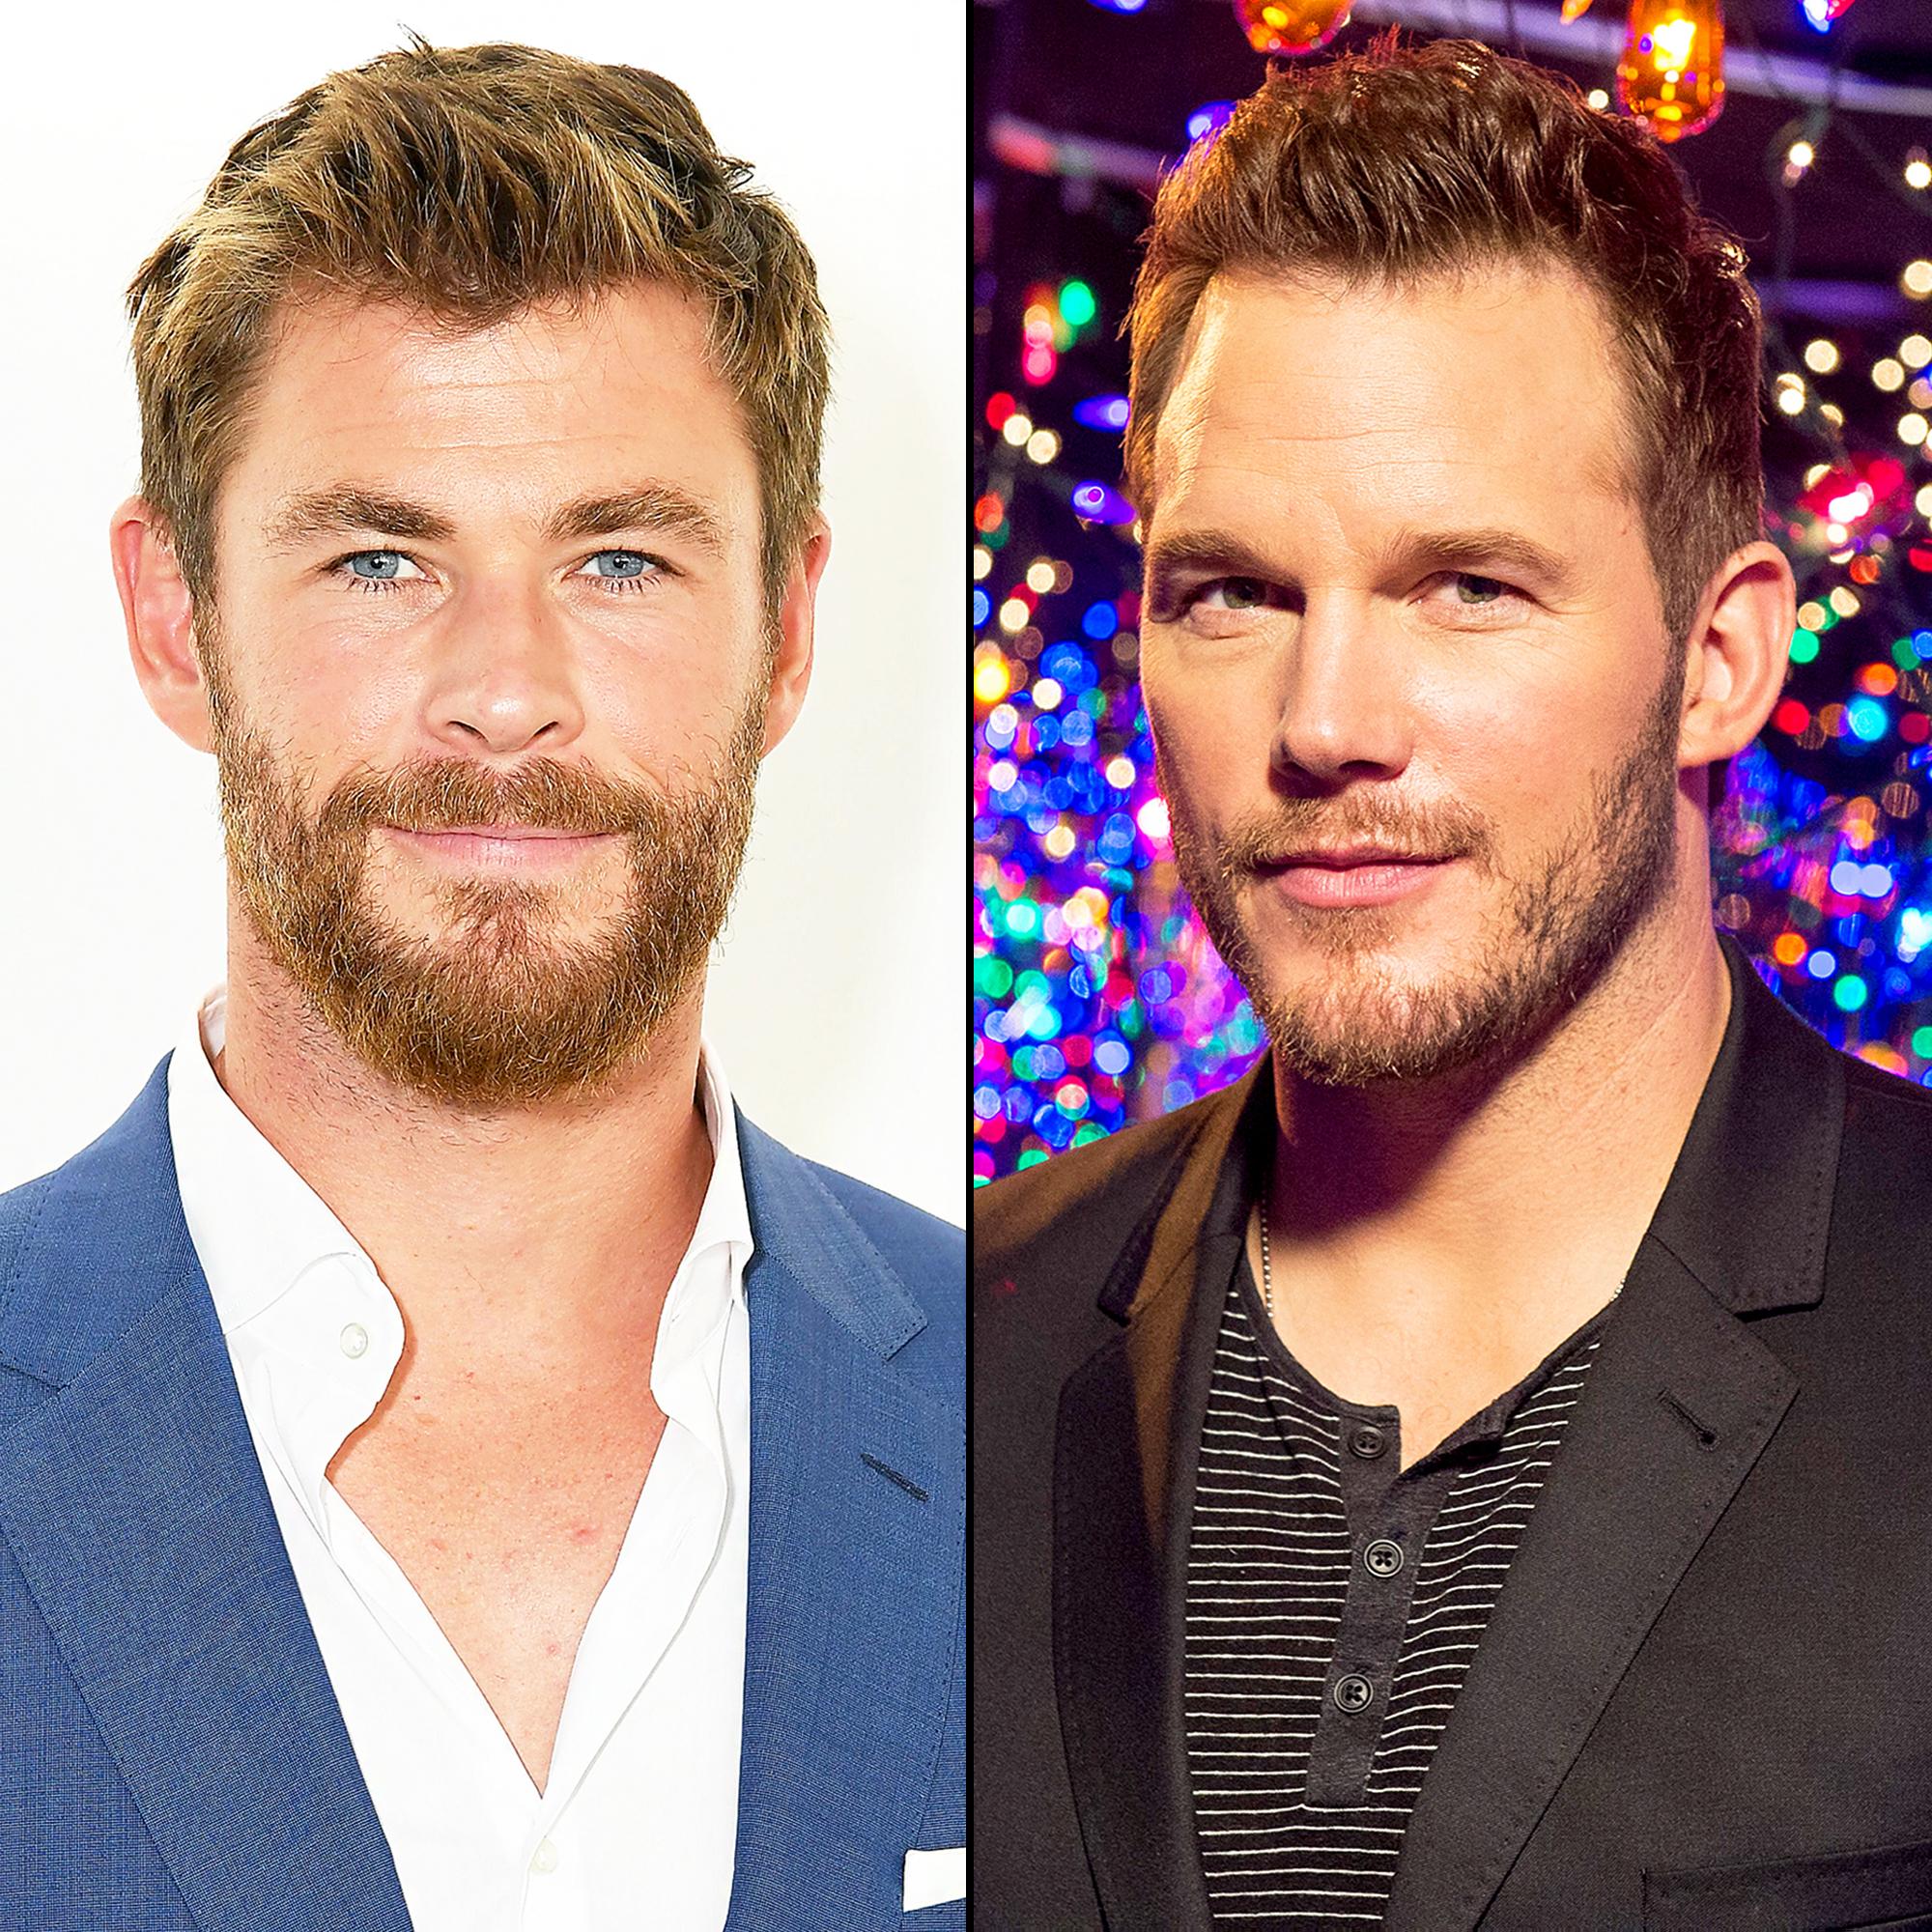 Chris Hemsworth and Chris Pratt